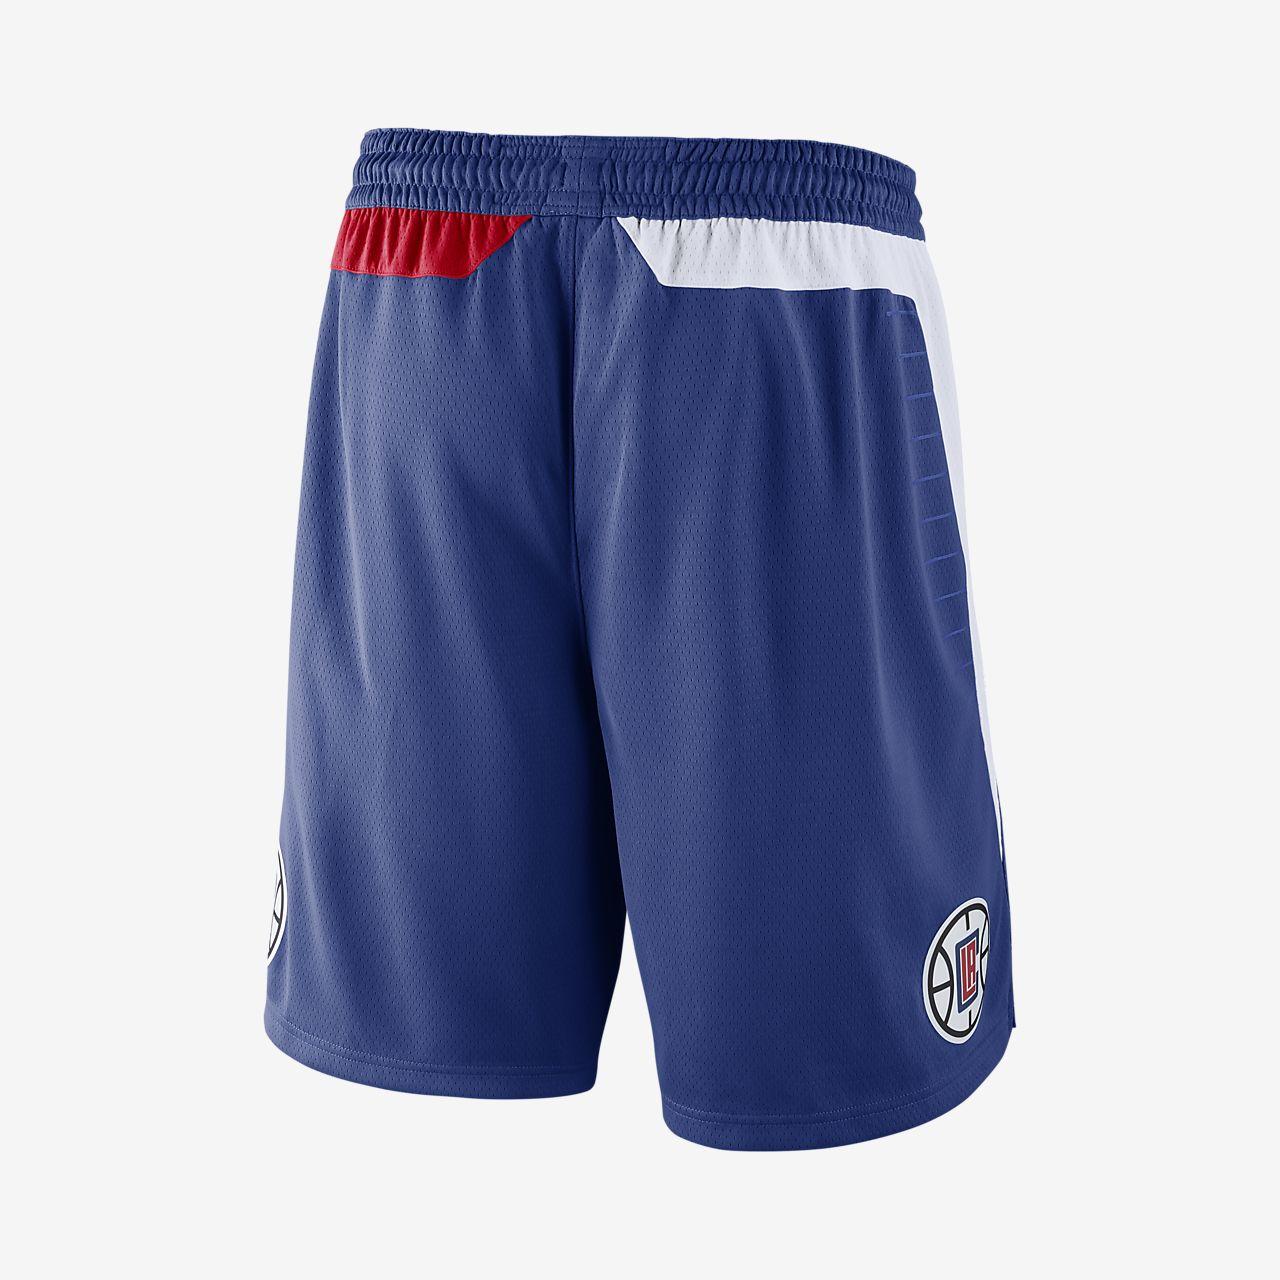 ... LA Clippers Nike Icon Edition Swingman Men's NBA Shorts